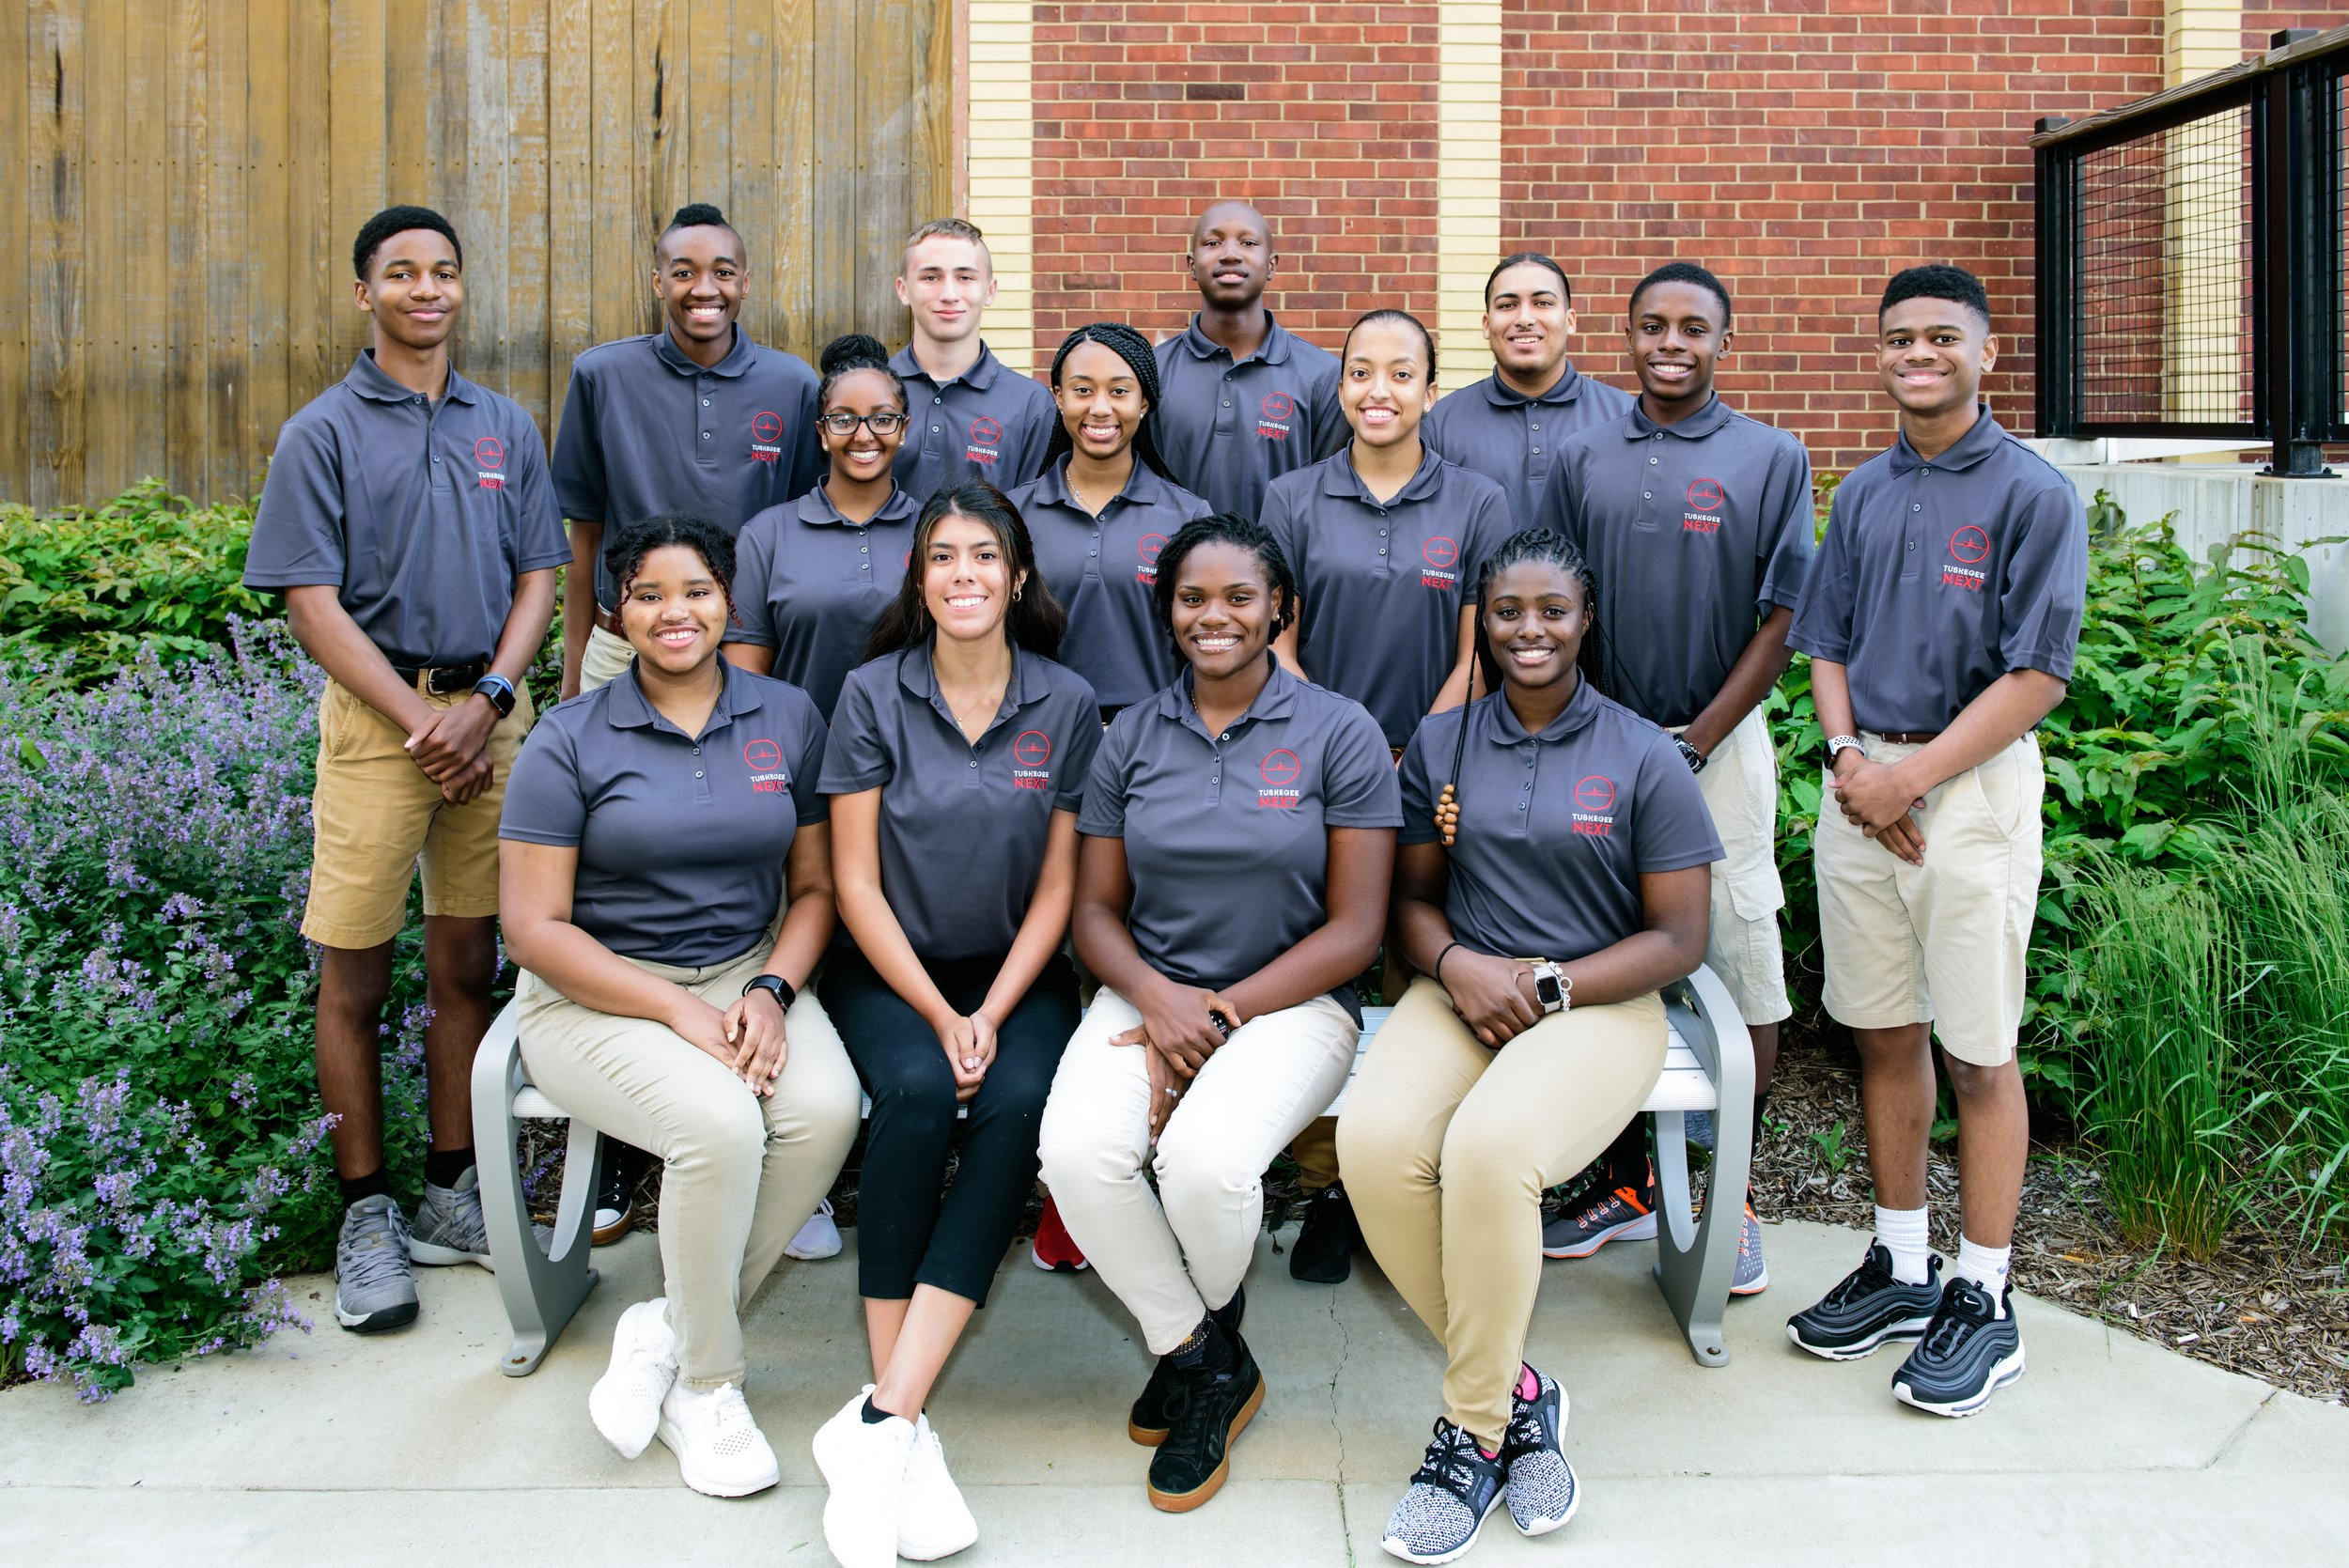 TN-2019-Cadets-Group-Sidewalk-Bench.jpg